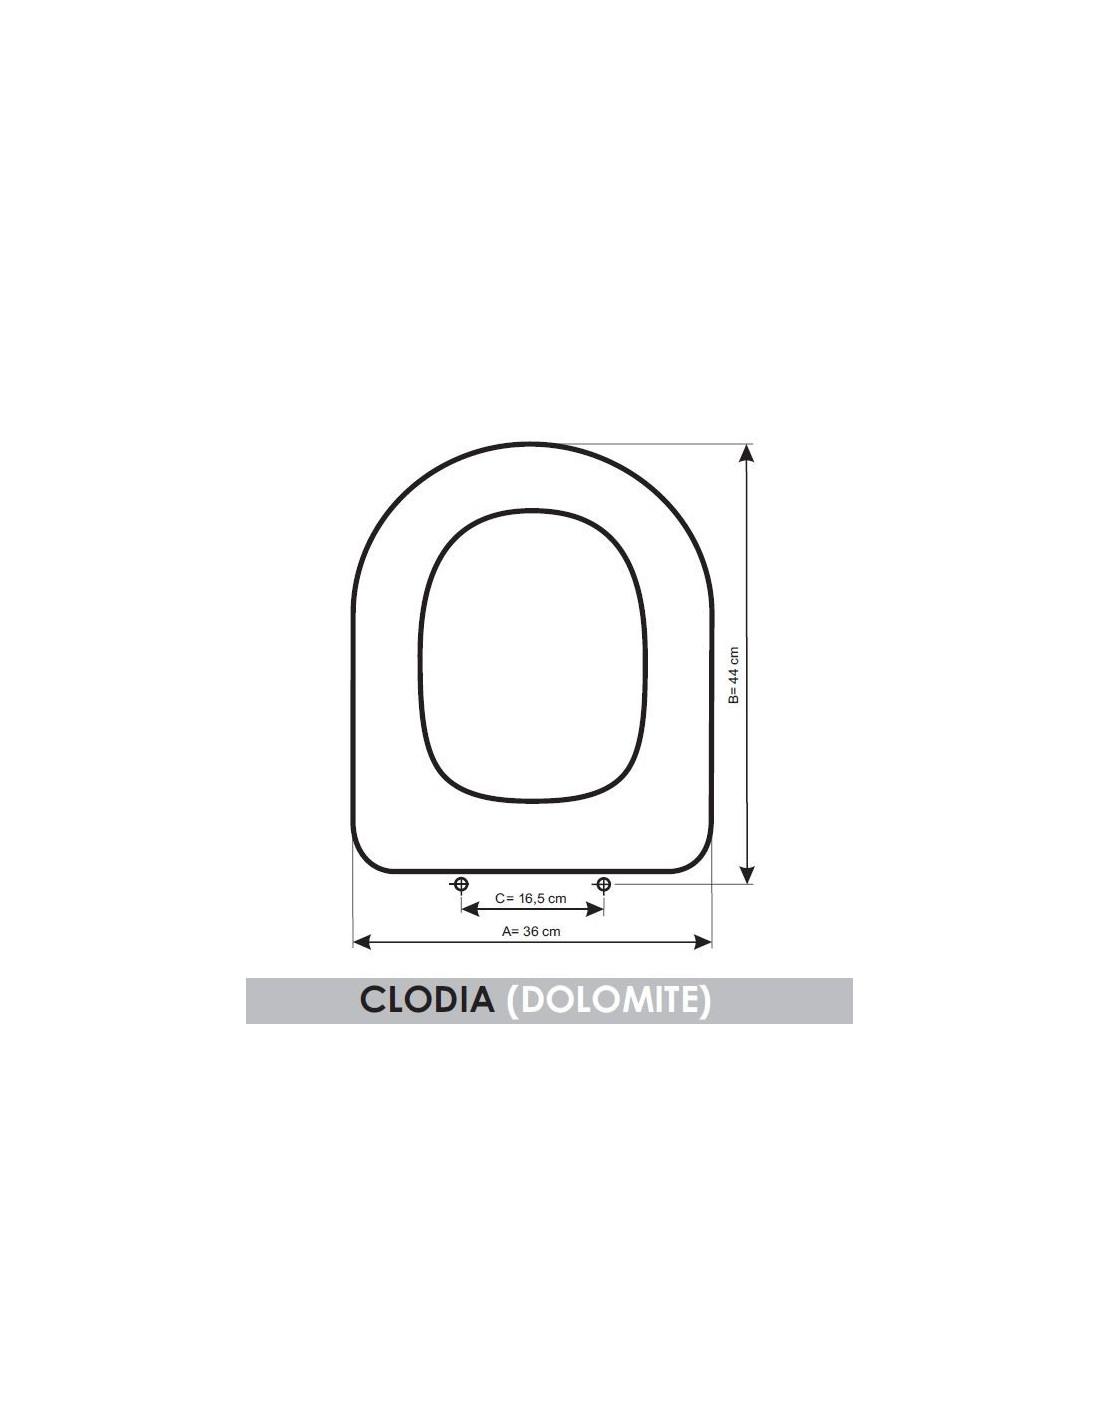 Sedile Wc Dolomite Clodia Prezzo.Sedile Wc Dolomite Clodia Adattabile In Resiwood Tapadelwater Com